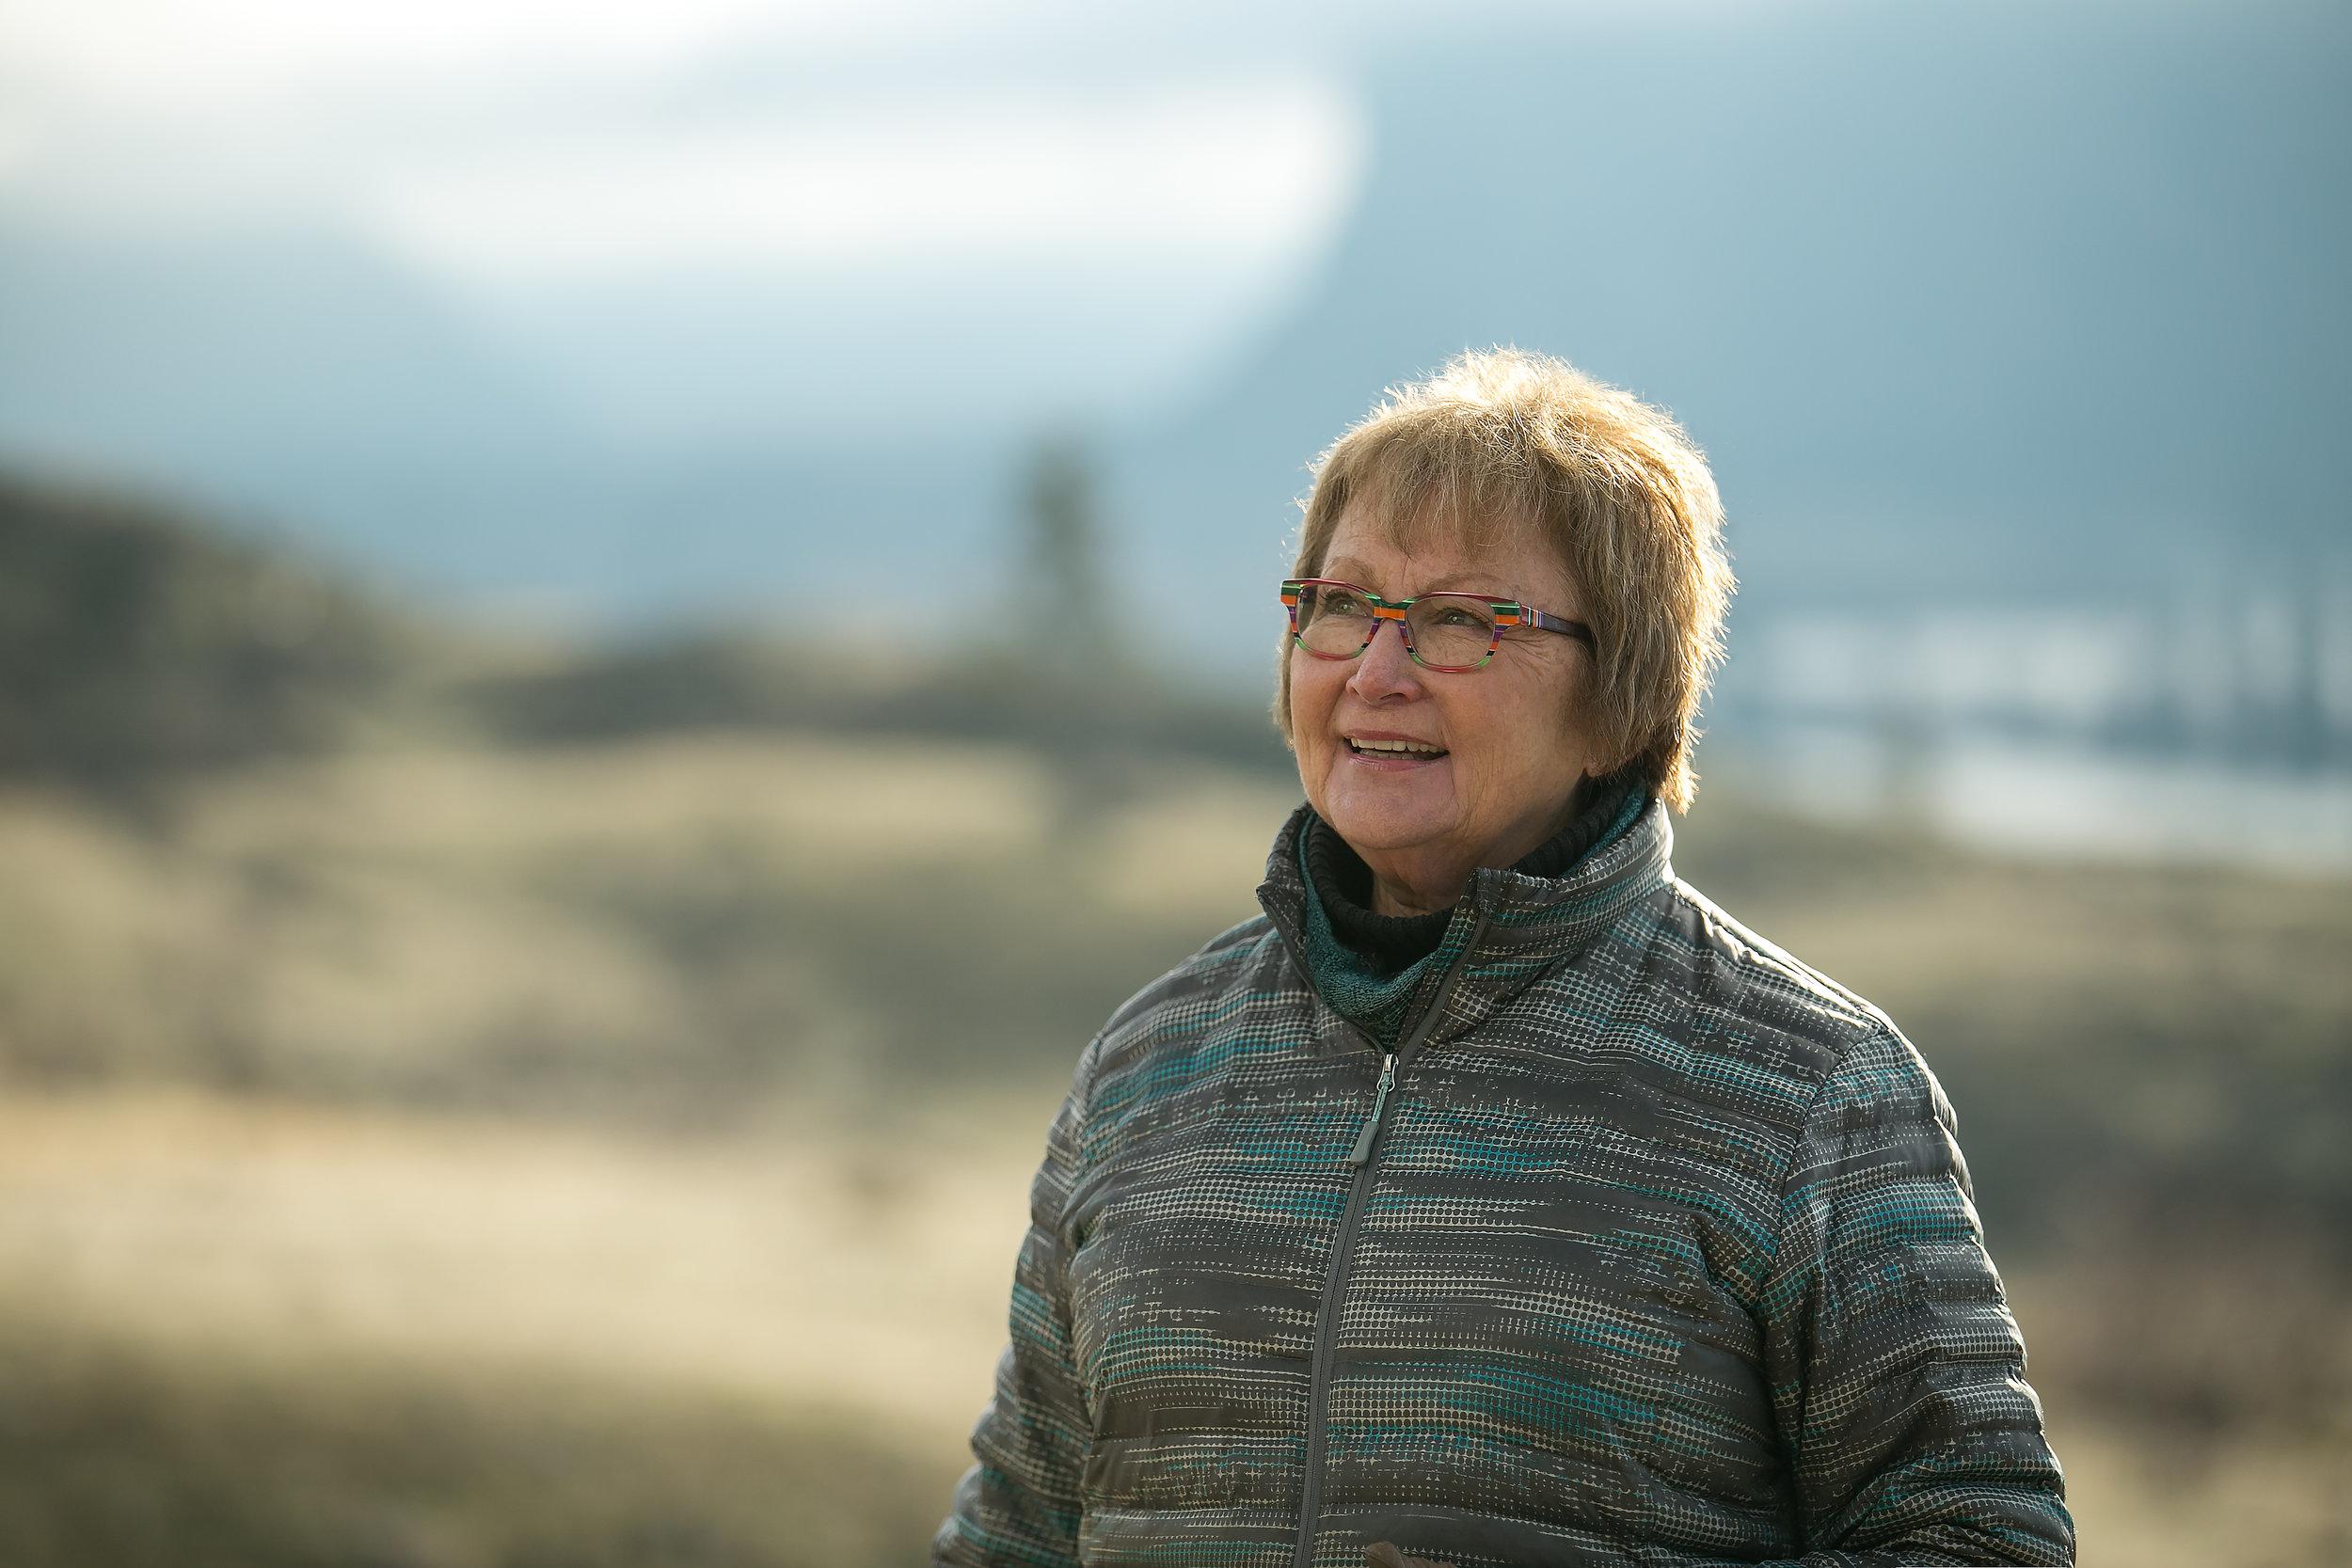 Doreen Olson of South Okanagan-Similkameen National Park Network